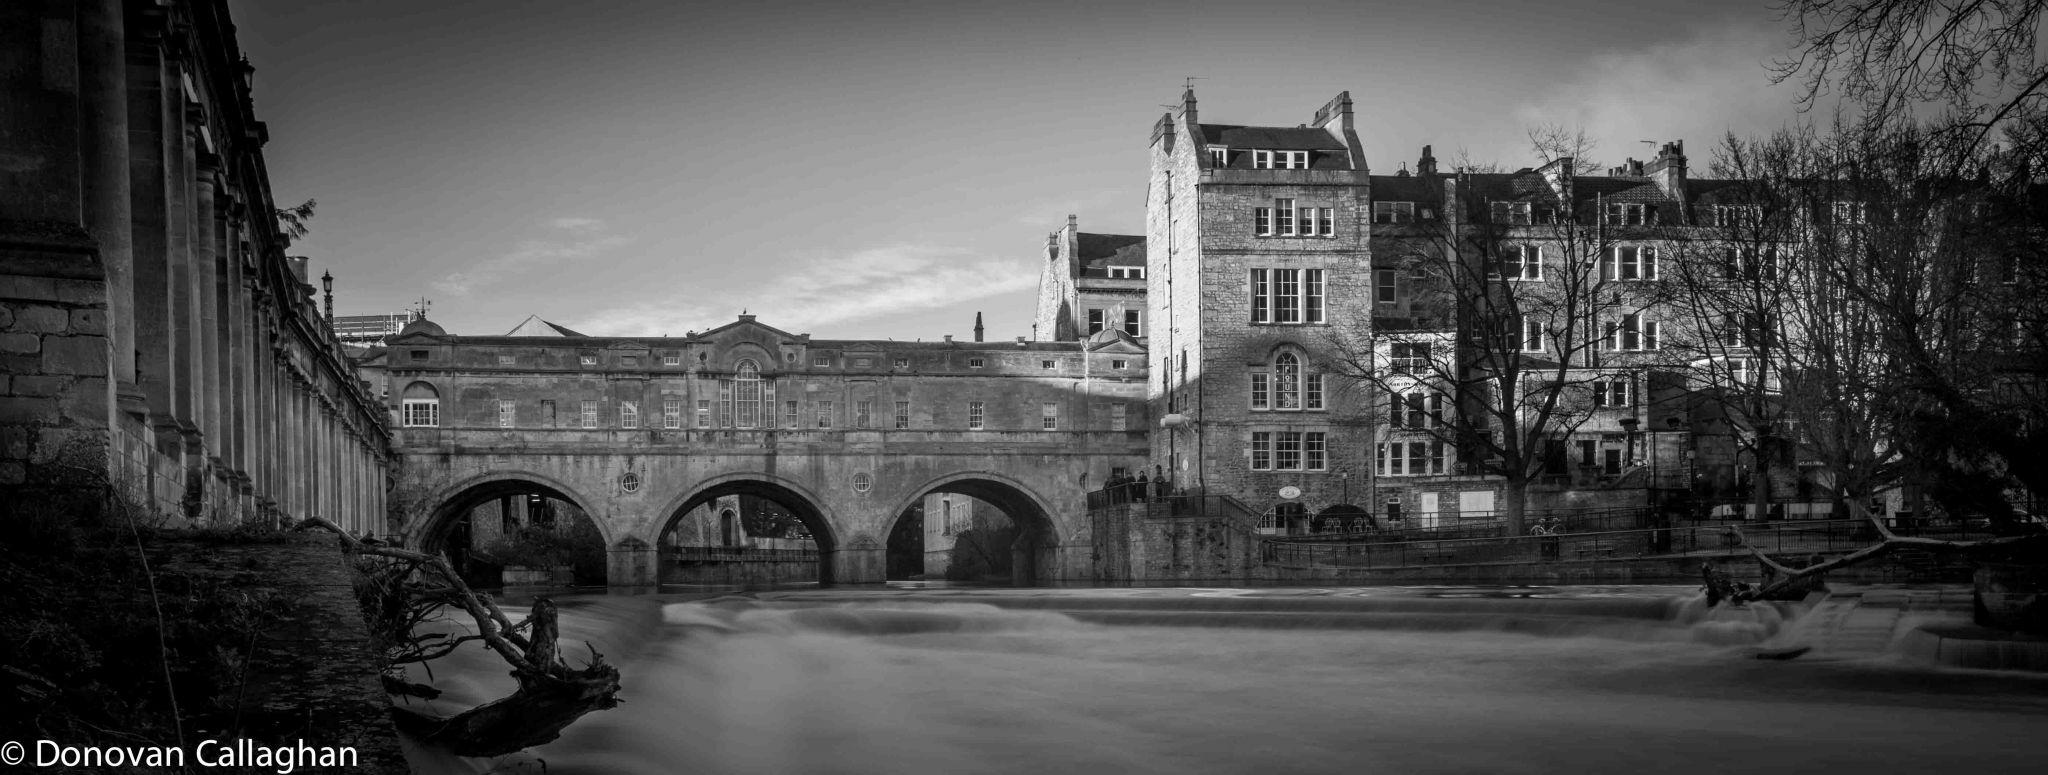 Pulteney Bridge Black & White, United Kingdom